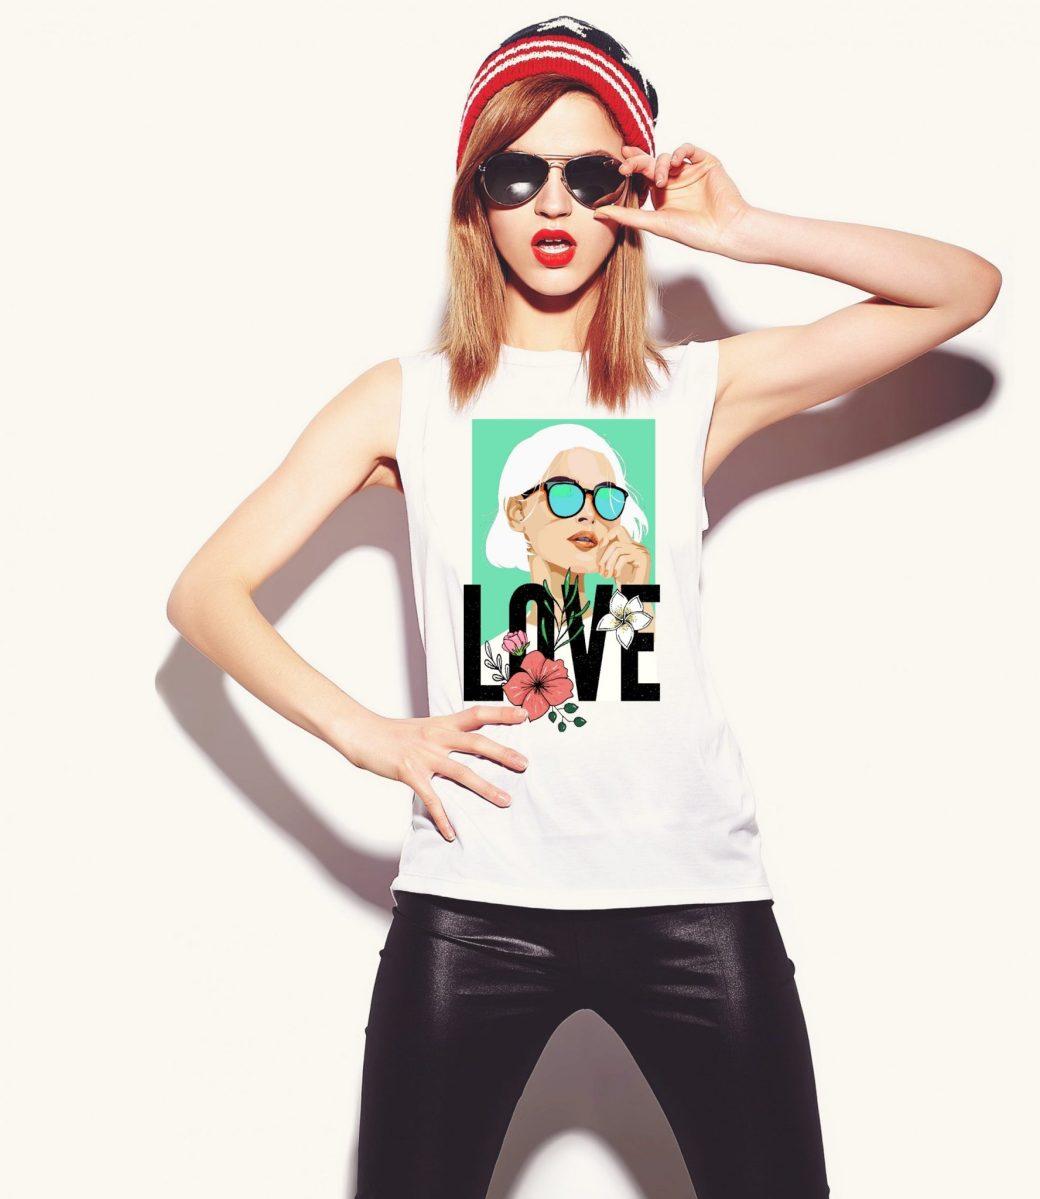 LOVE camiseta ilustrada para chica ilustracion camisetas para mujer ropa de mujer outfit de influencer